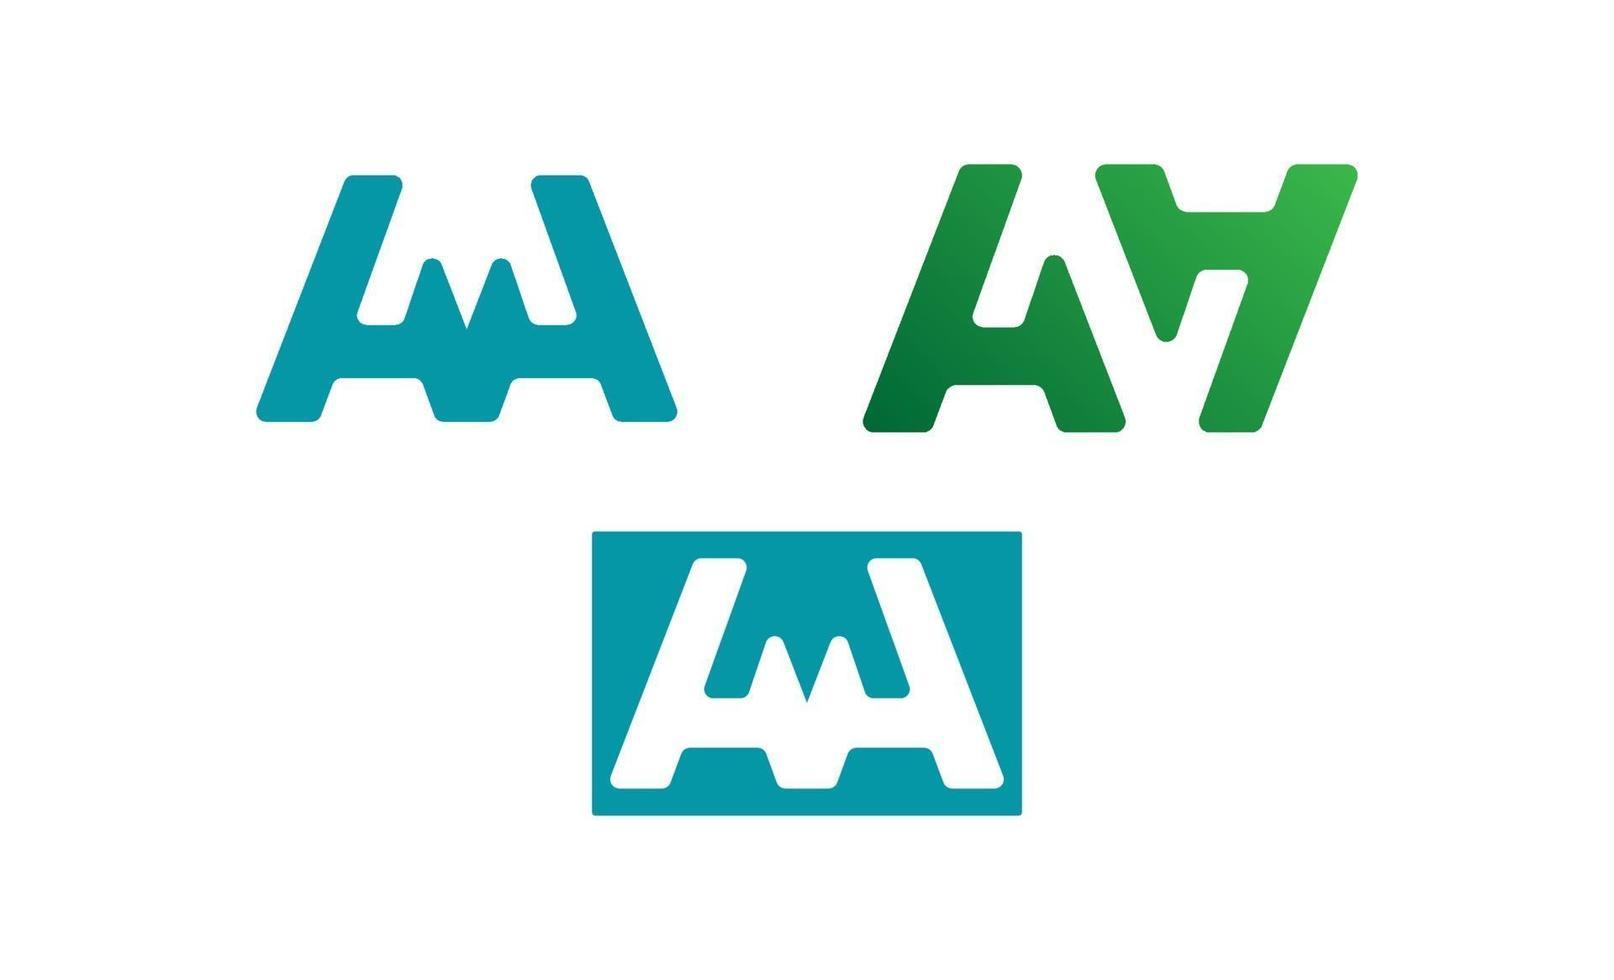 brev en logotyp set kreativ inspiration design vektor